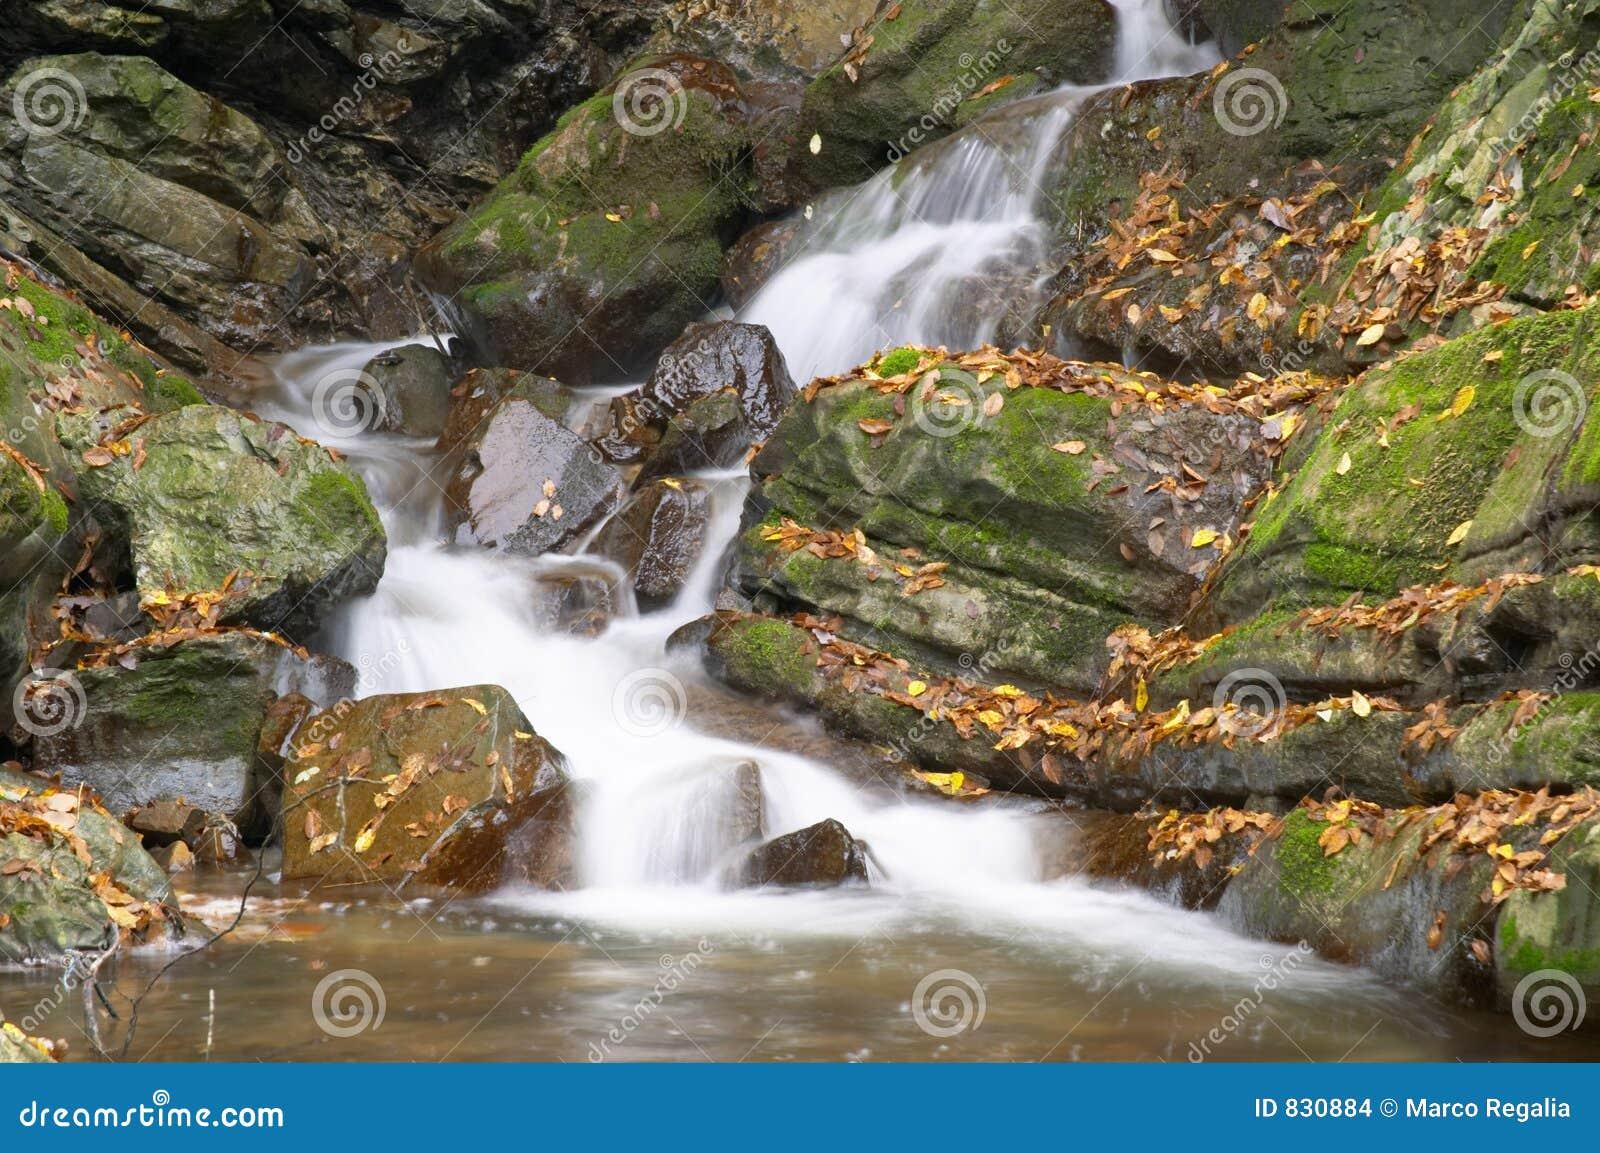 Rapids in a mountain brook